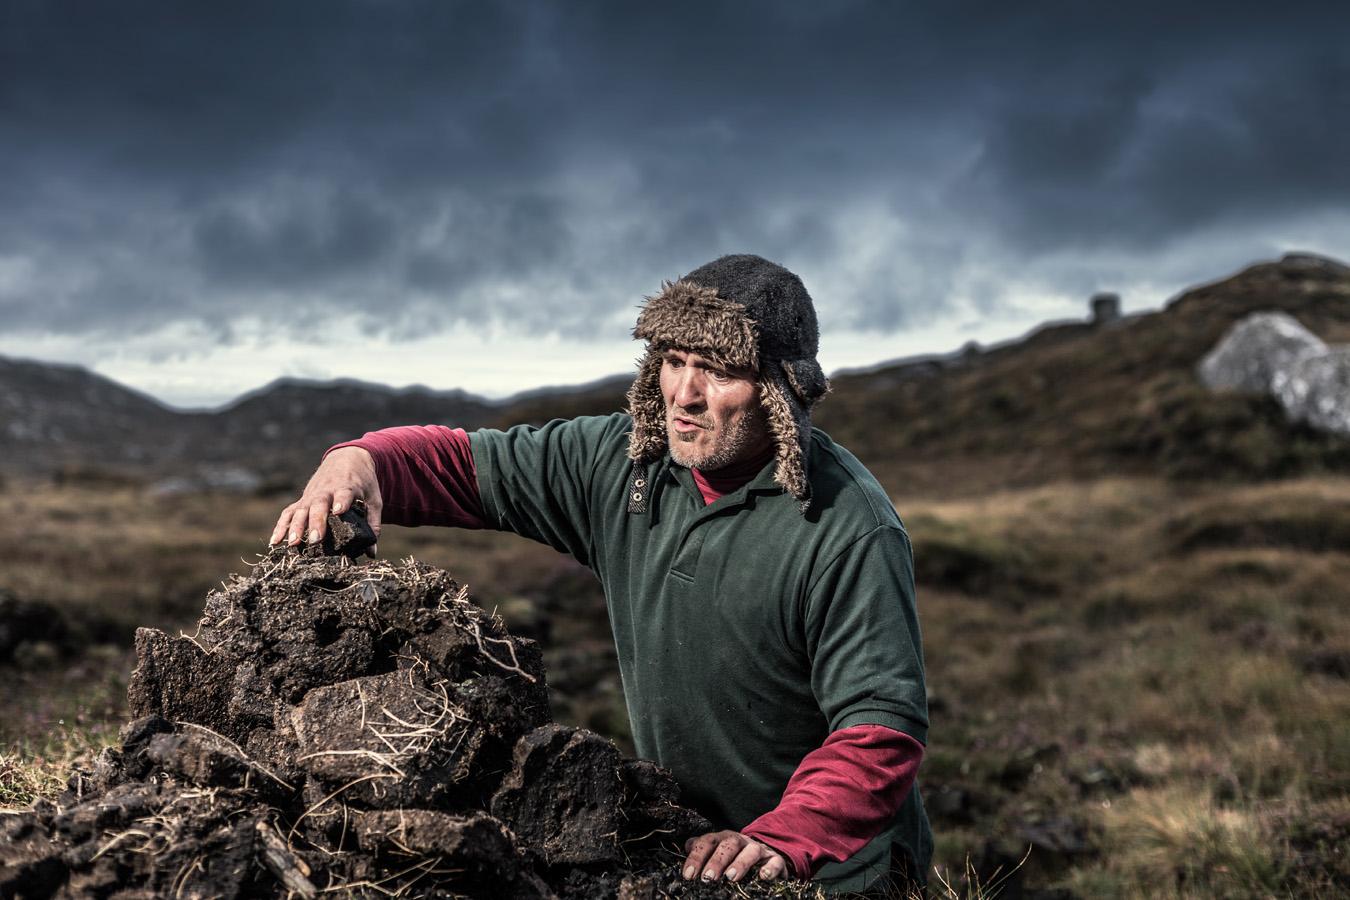 Harris Islander portraits